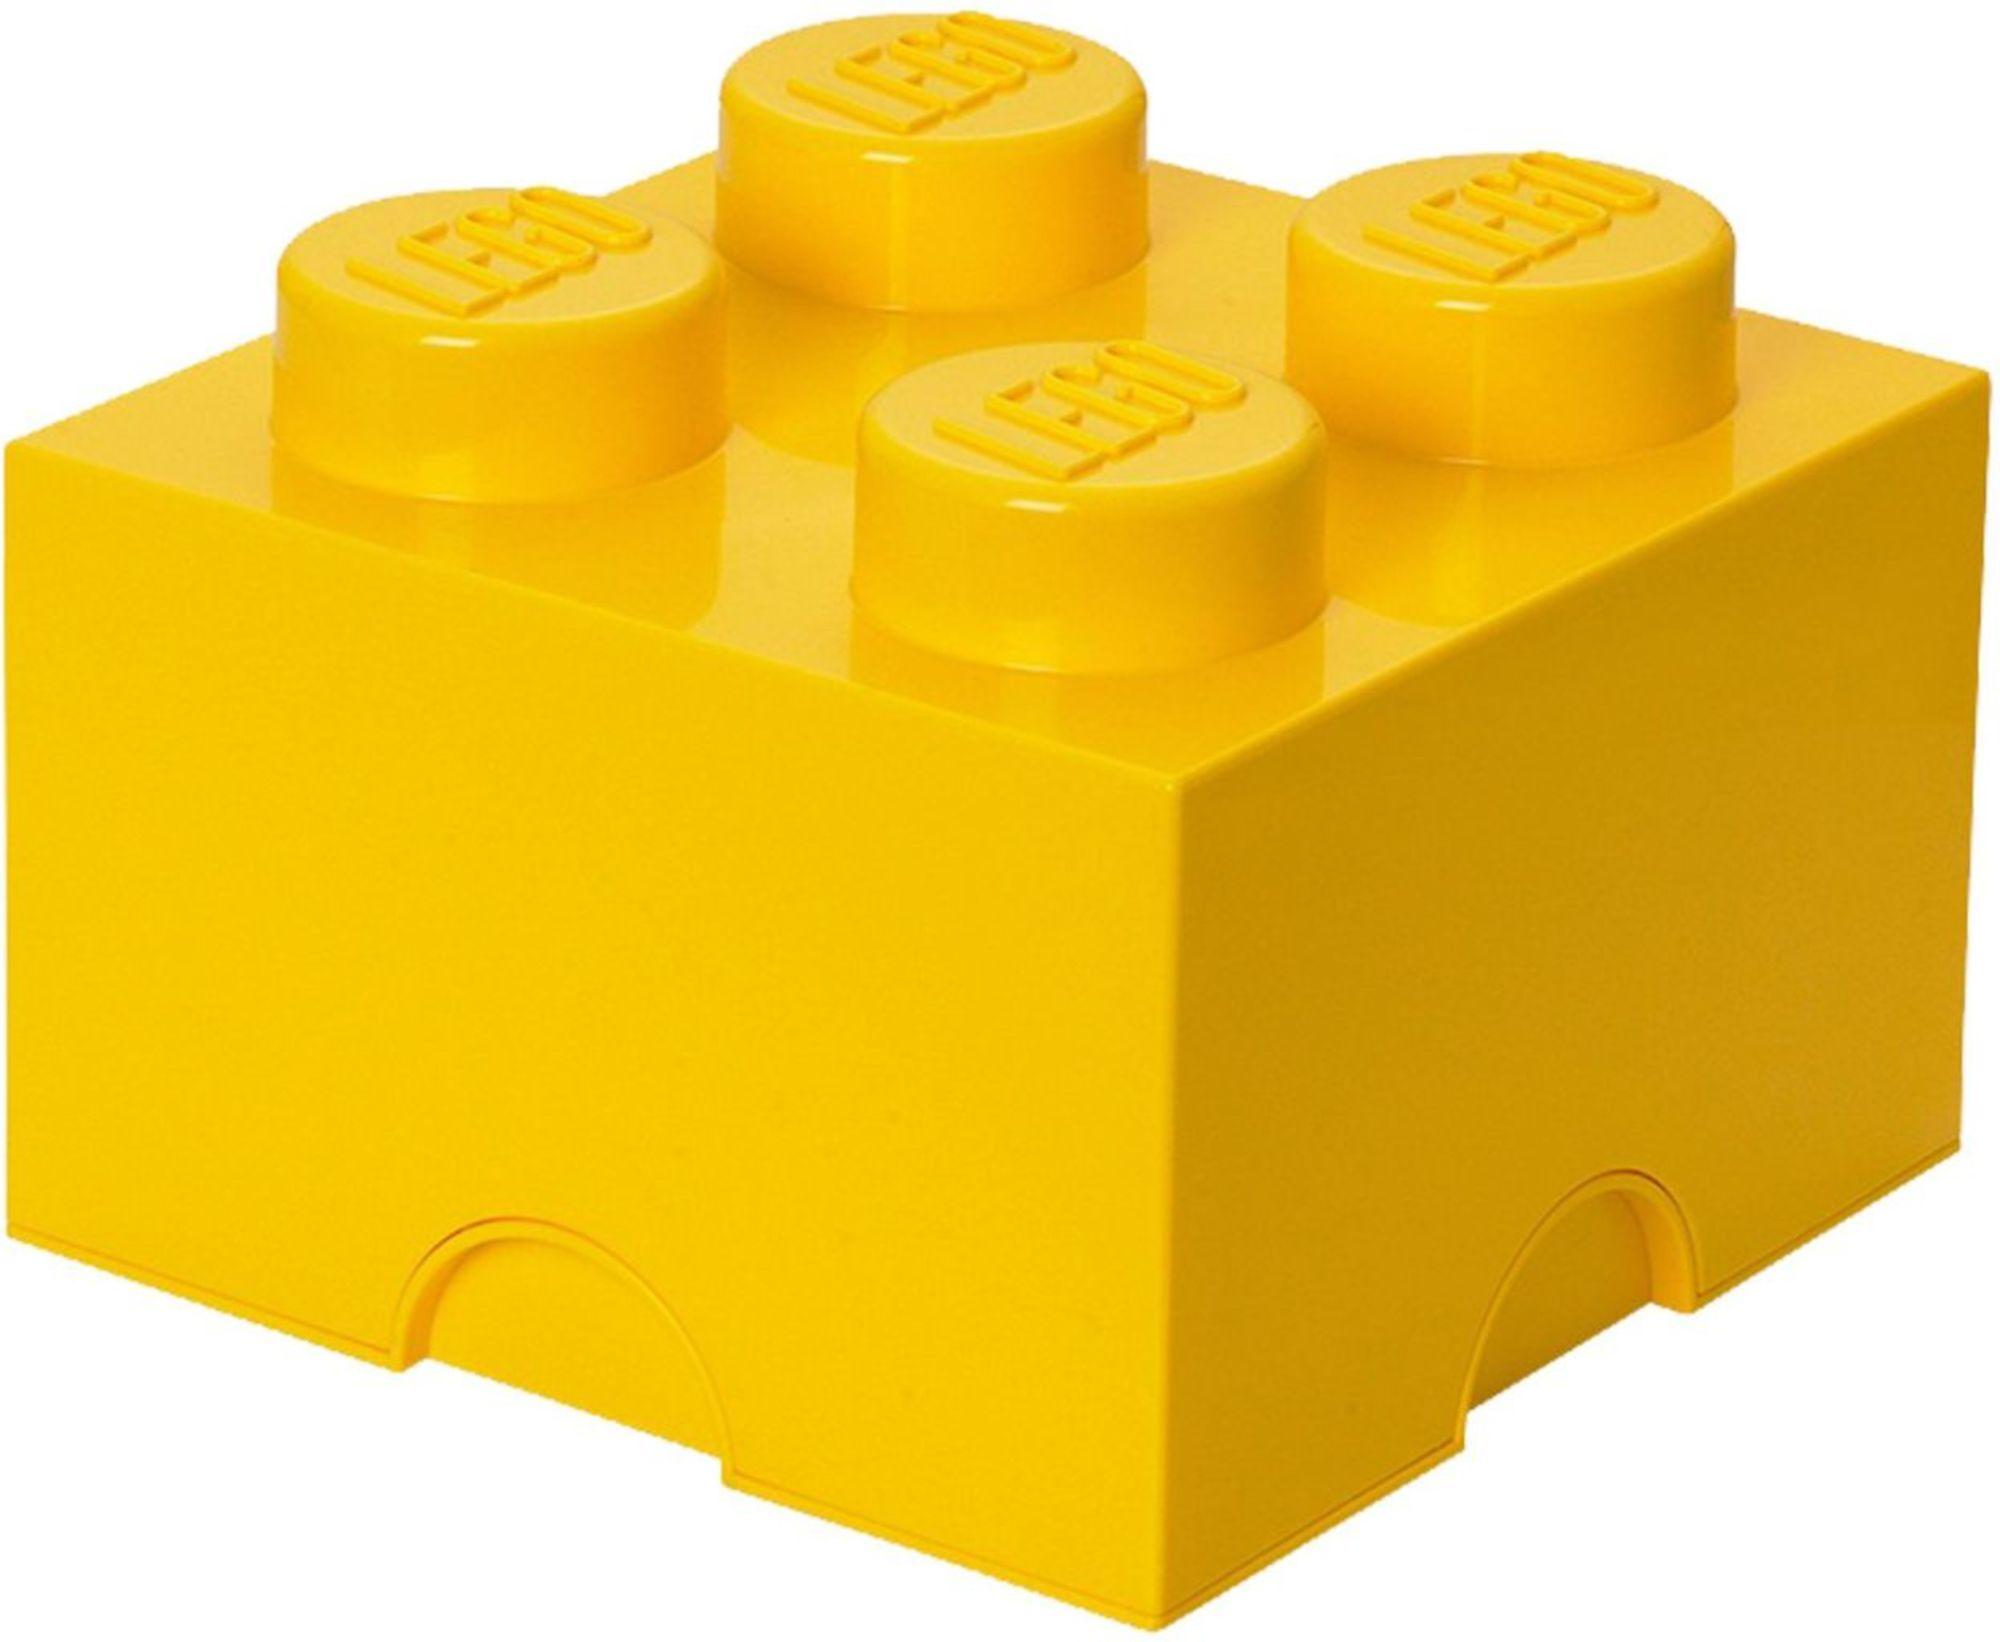 Lego Oppbevaring 4 Gul